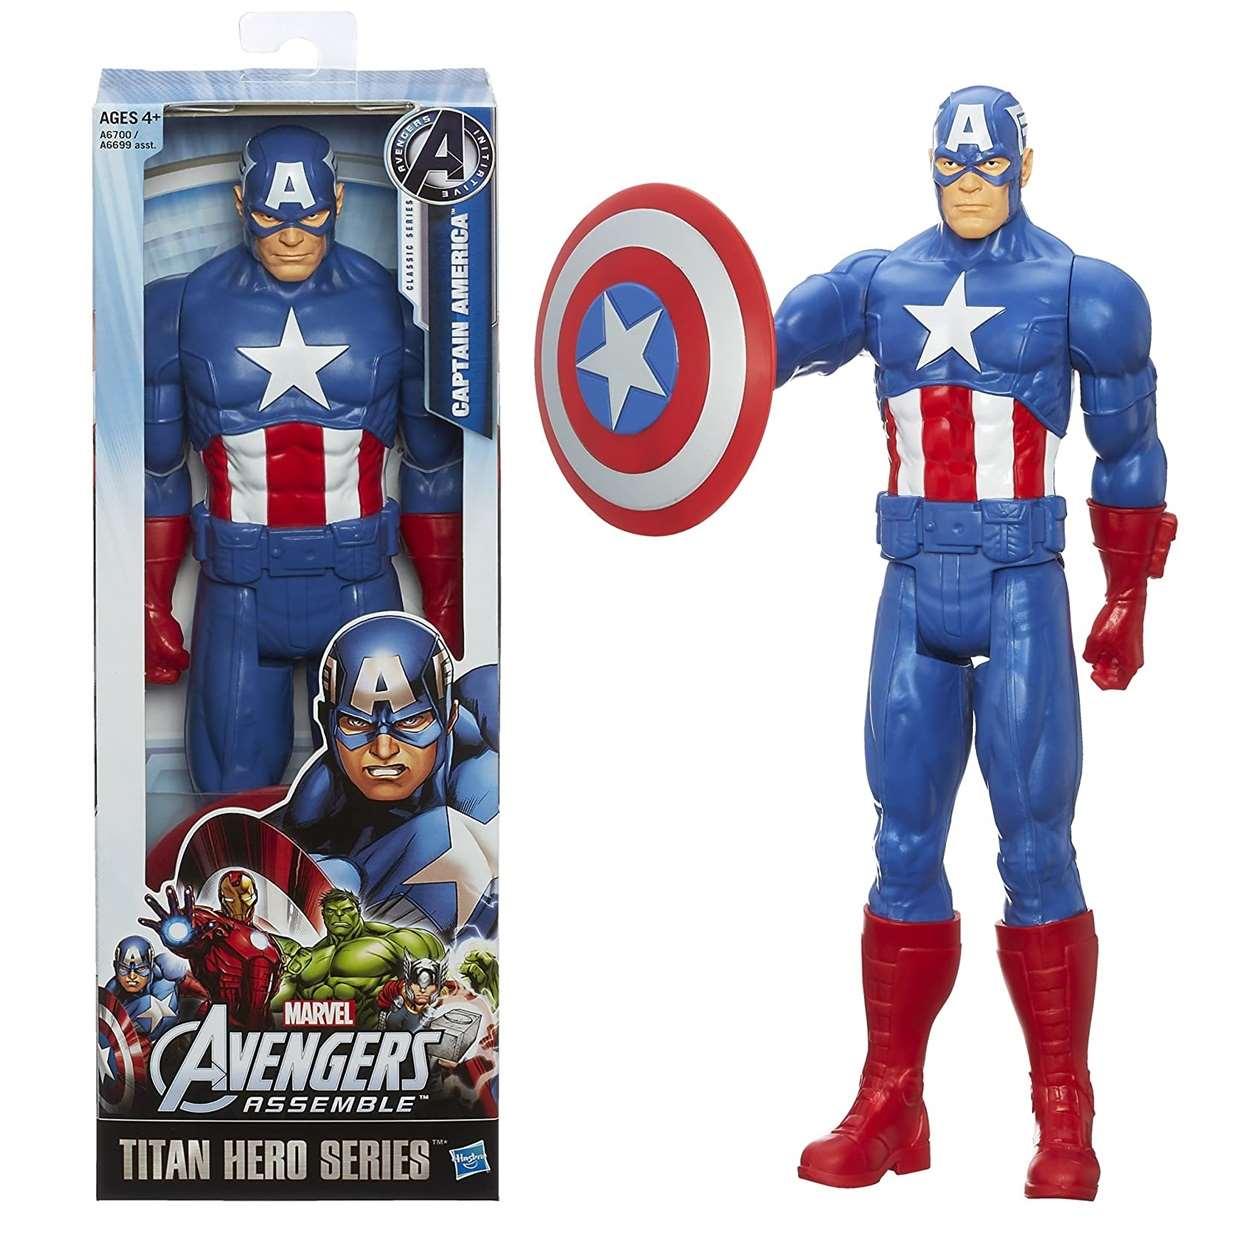 Capitán América Figura Avengers Assemble Titan Hero 12 Pulg